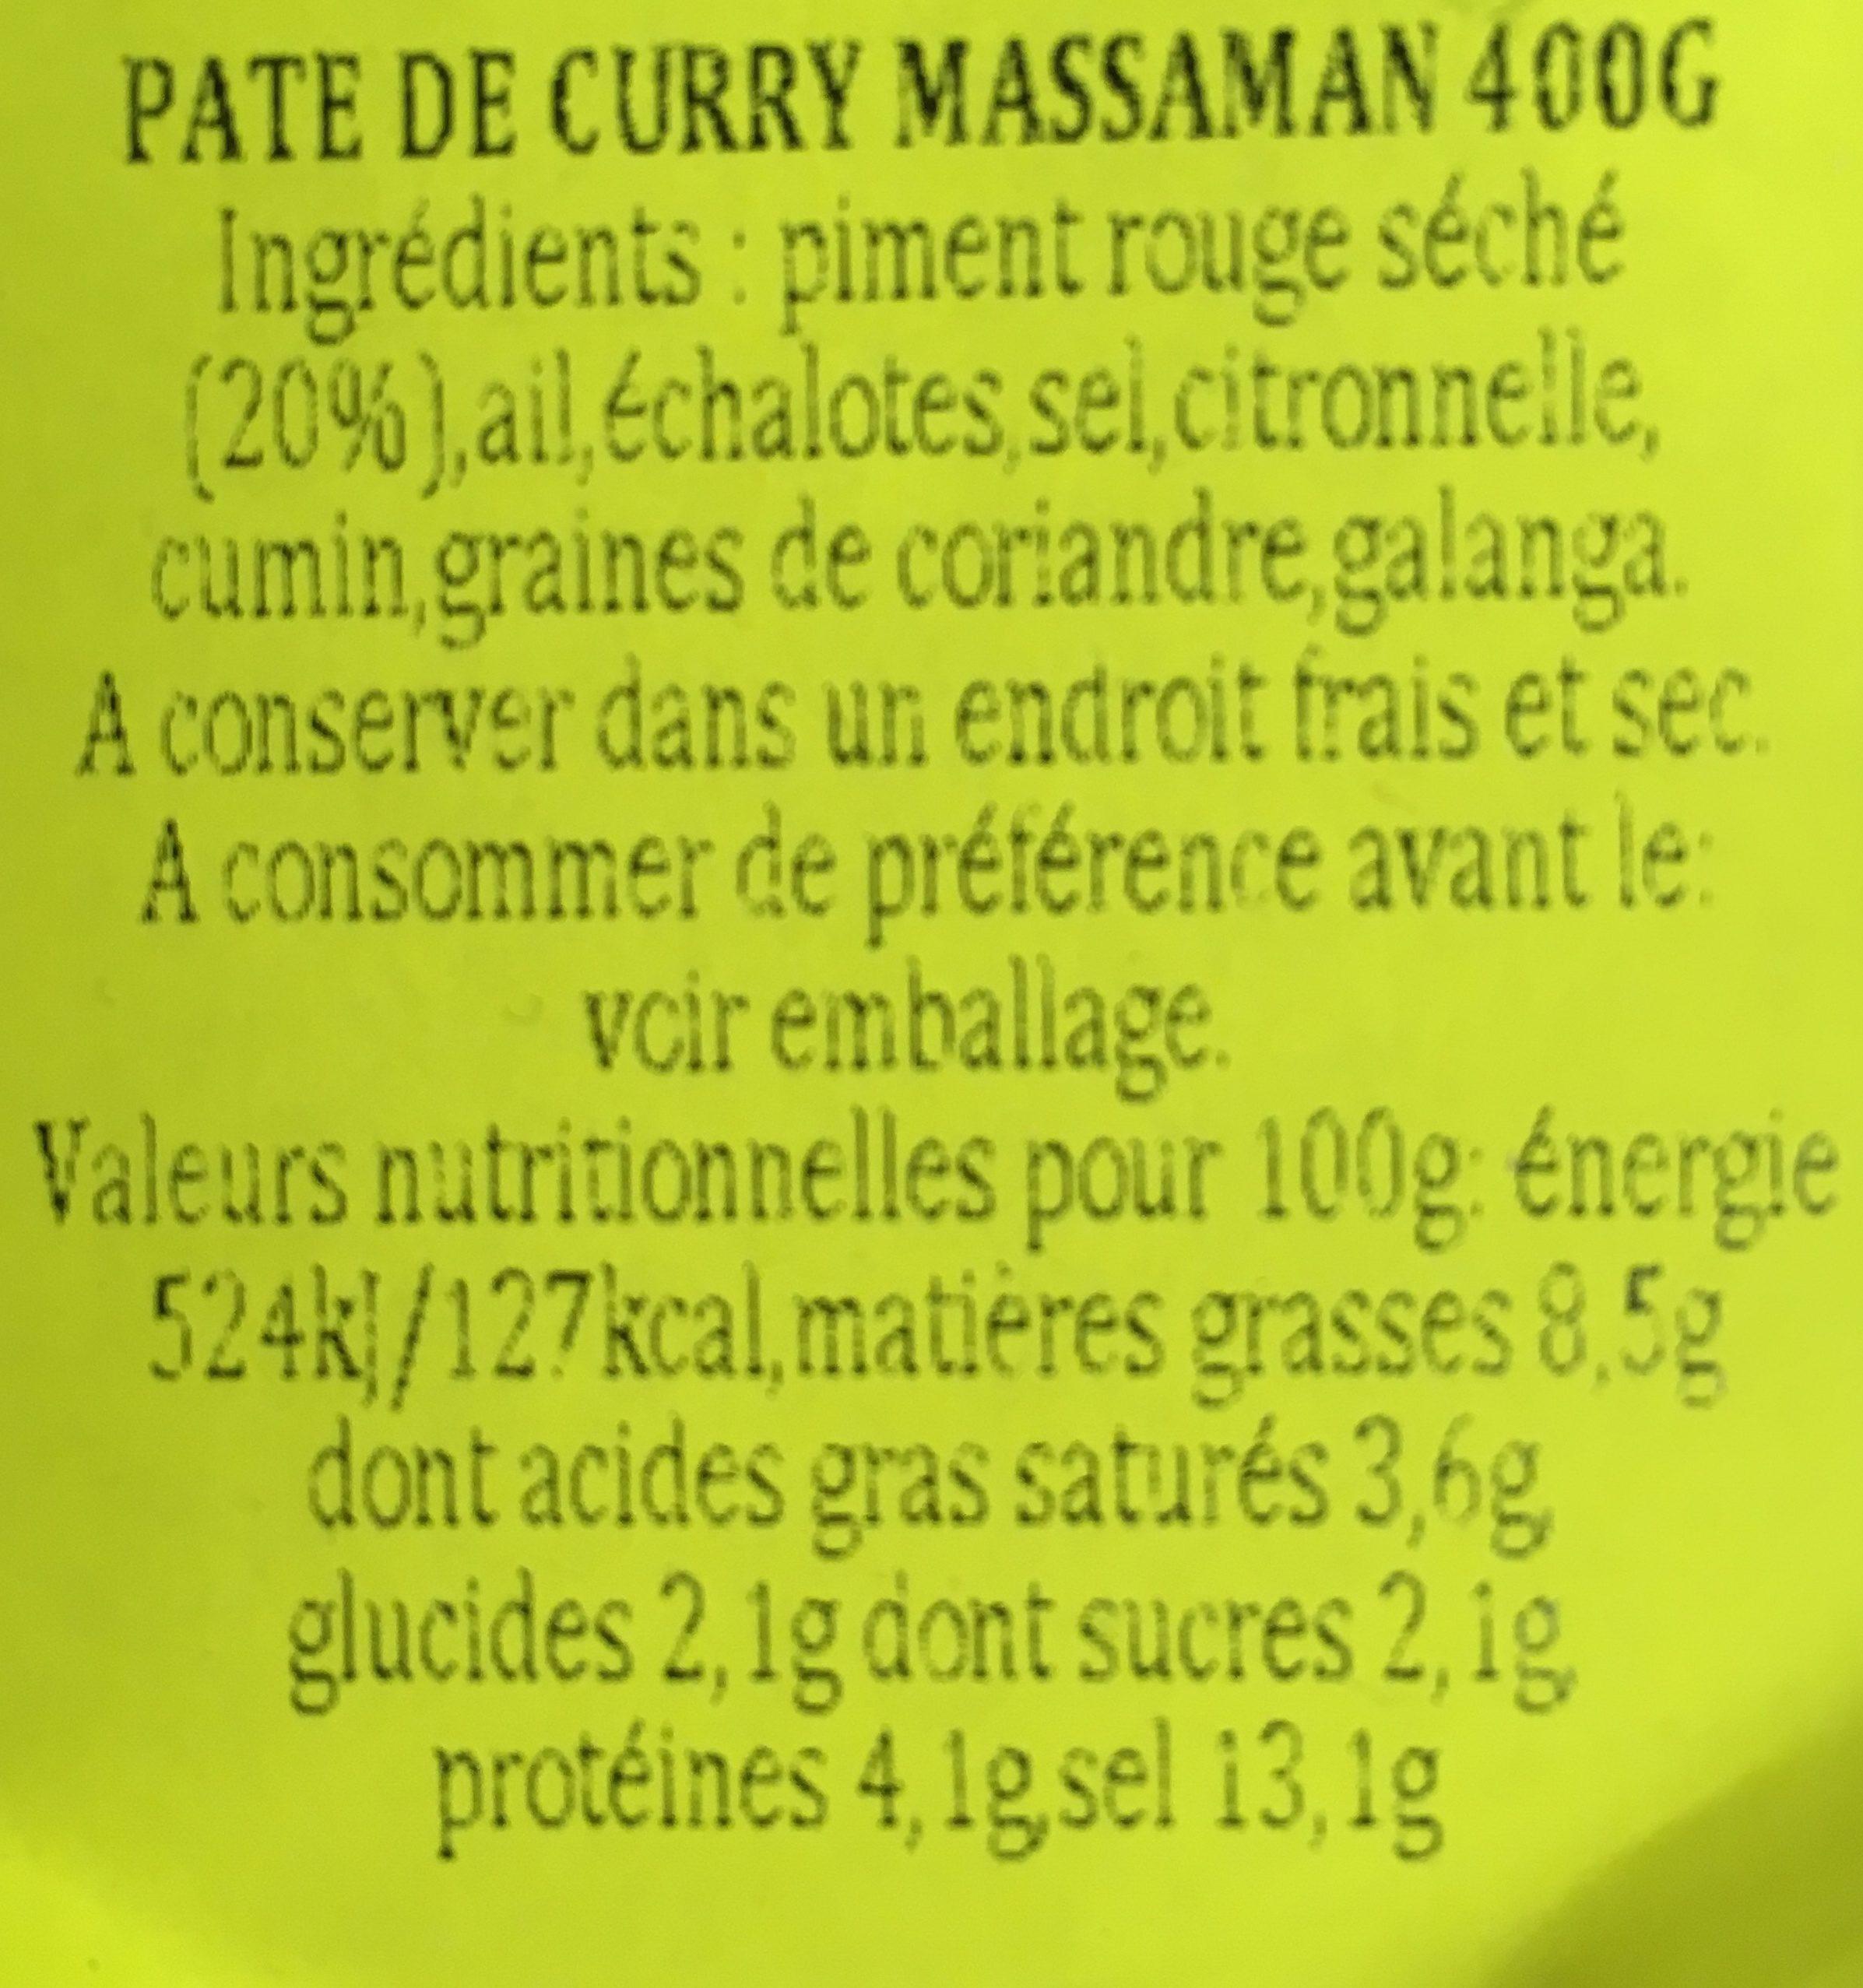 Pate De Curry Matsaman - Ingrédients